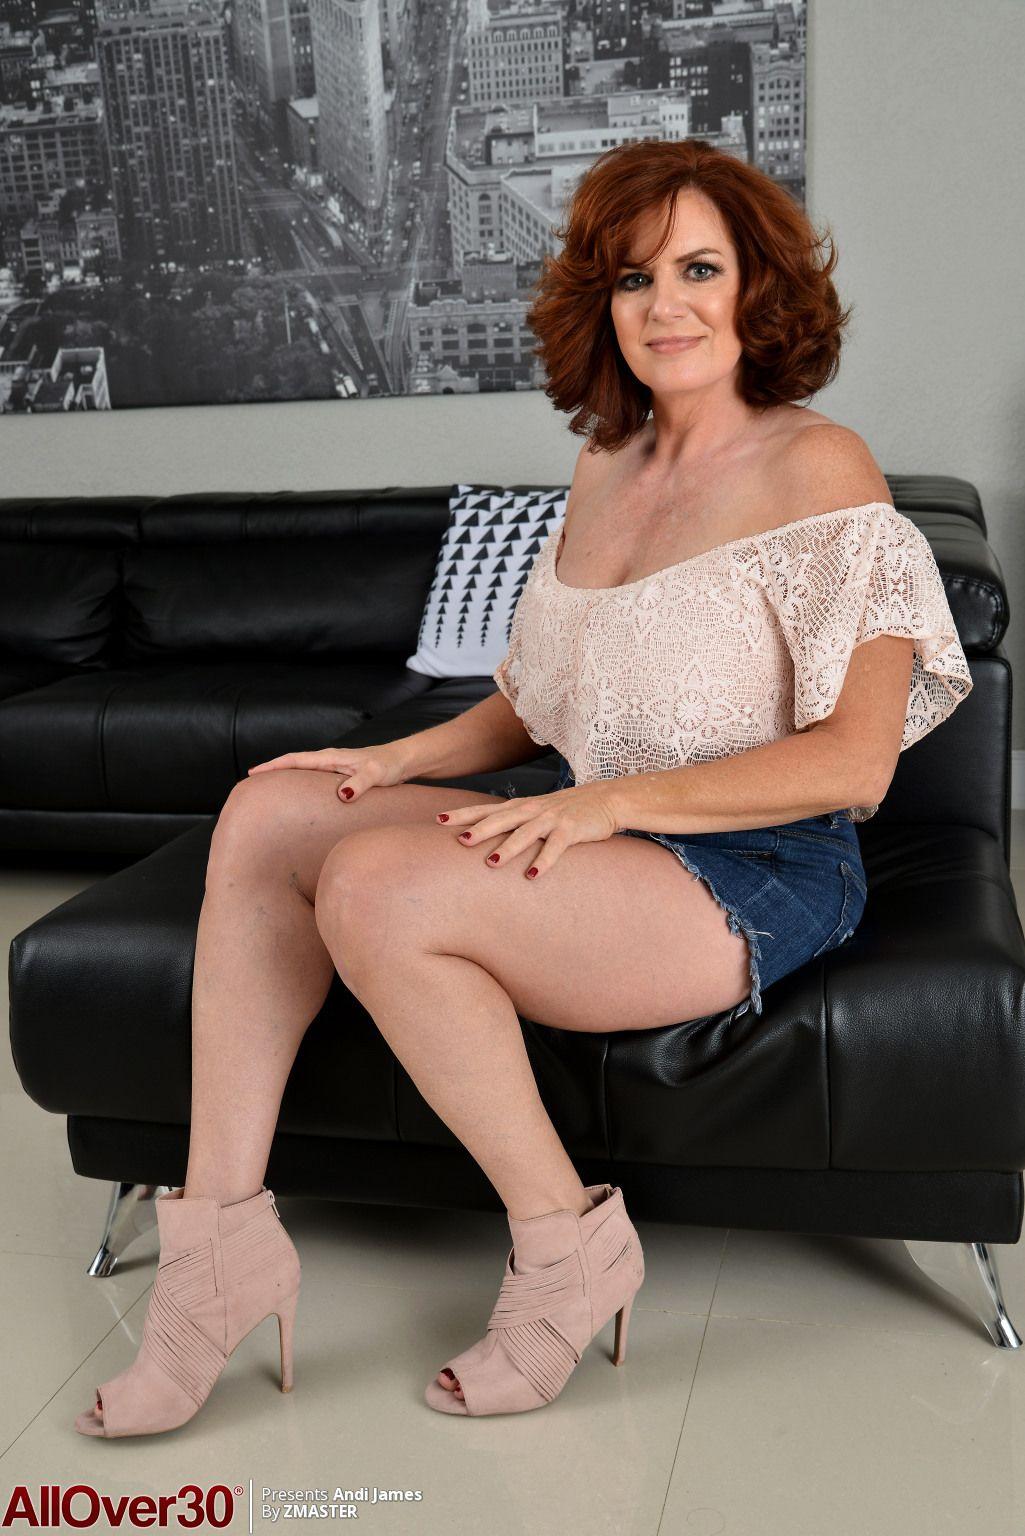 Feet Aida Domenech nudes (49 photos), Tits, Is a cute, Instagram, lingerie 2017